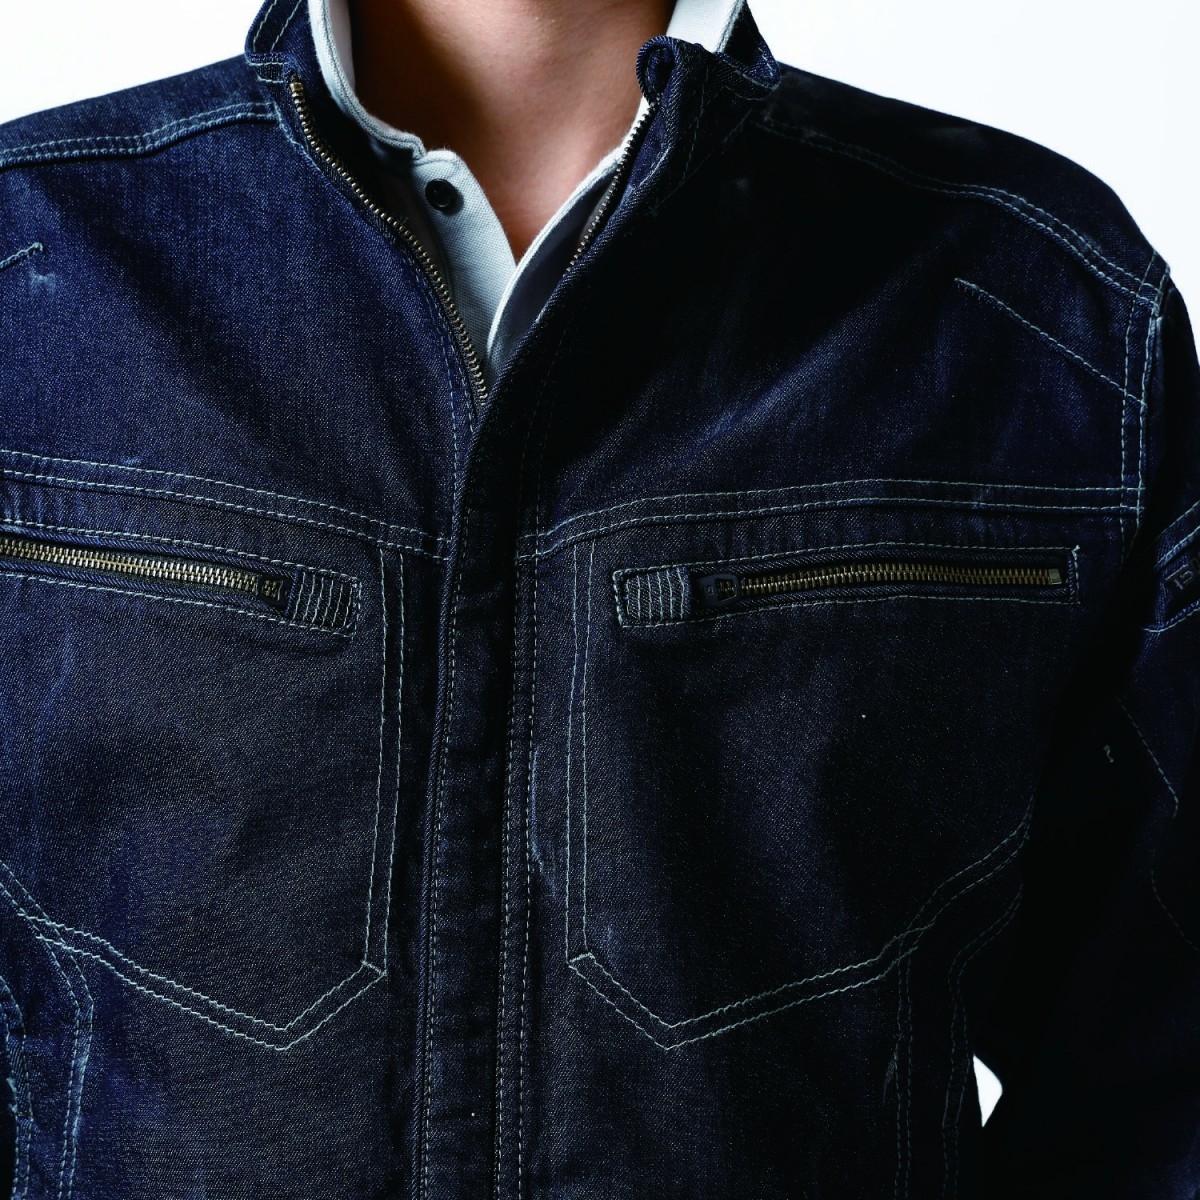 TS DESIGN 5116 ジャケット ¥5,940(税込)大型のファスナー採用。使い易さが違います。